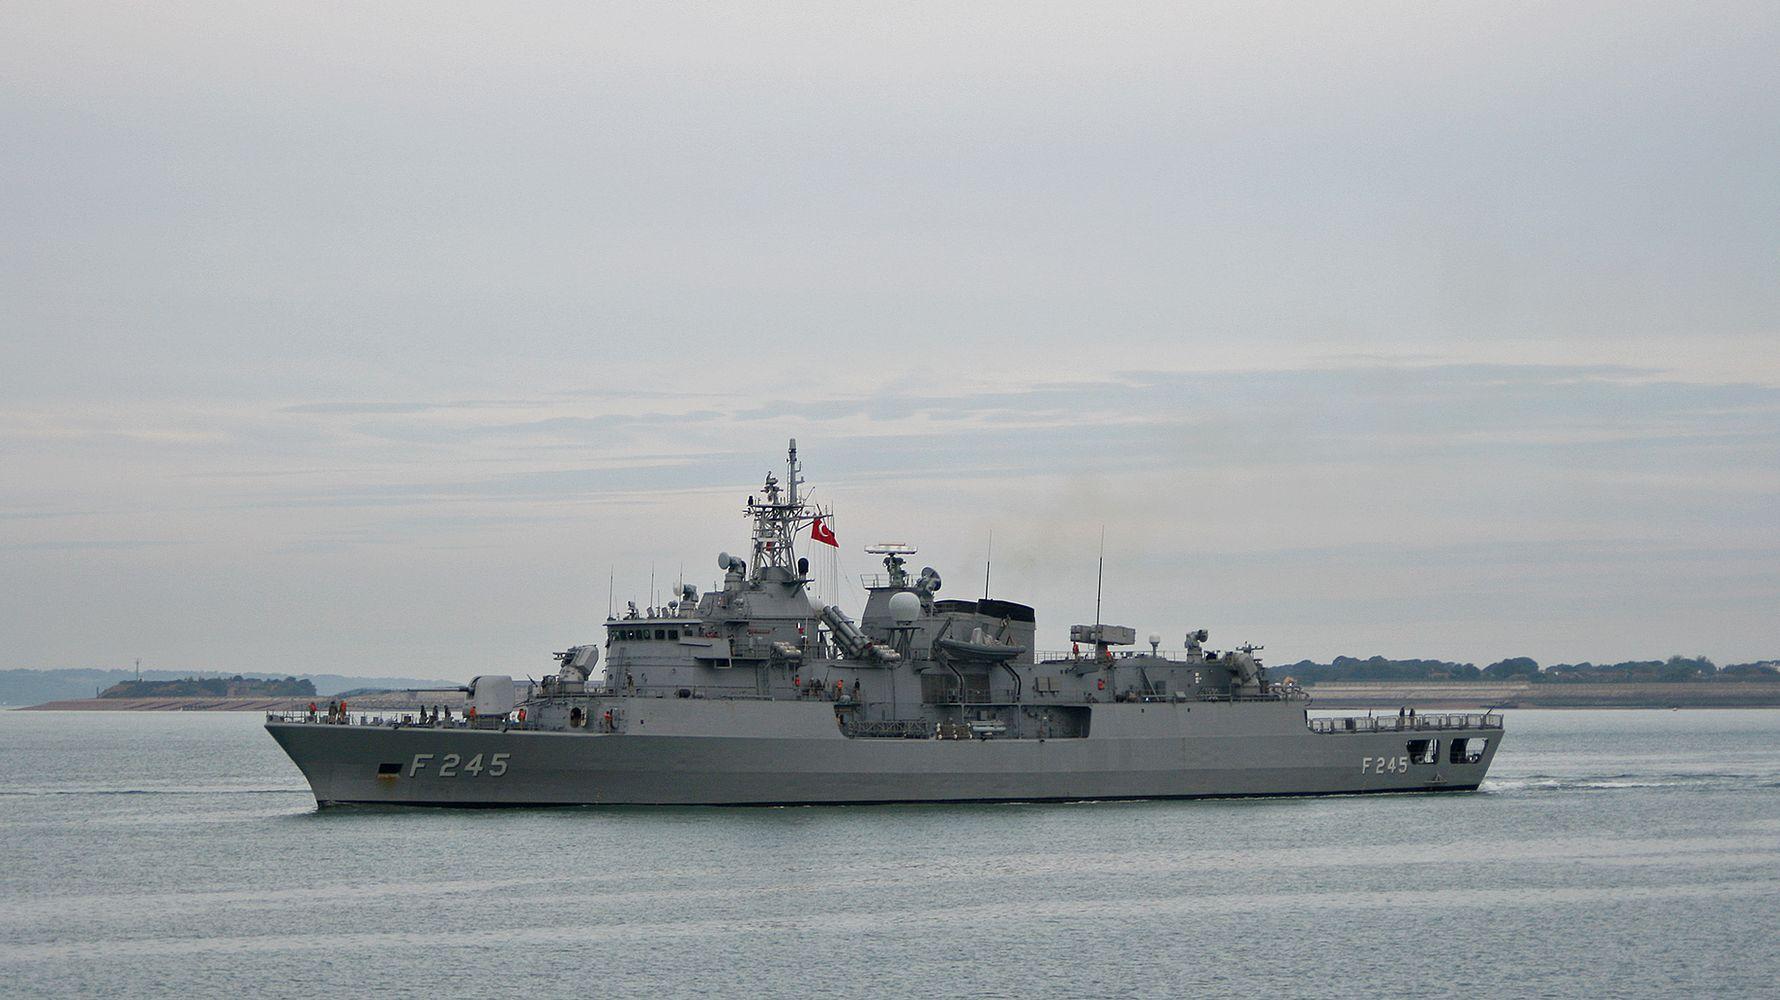 Barbarosse and gabya class frigates modernized with local gyro